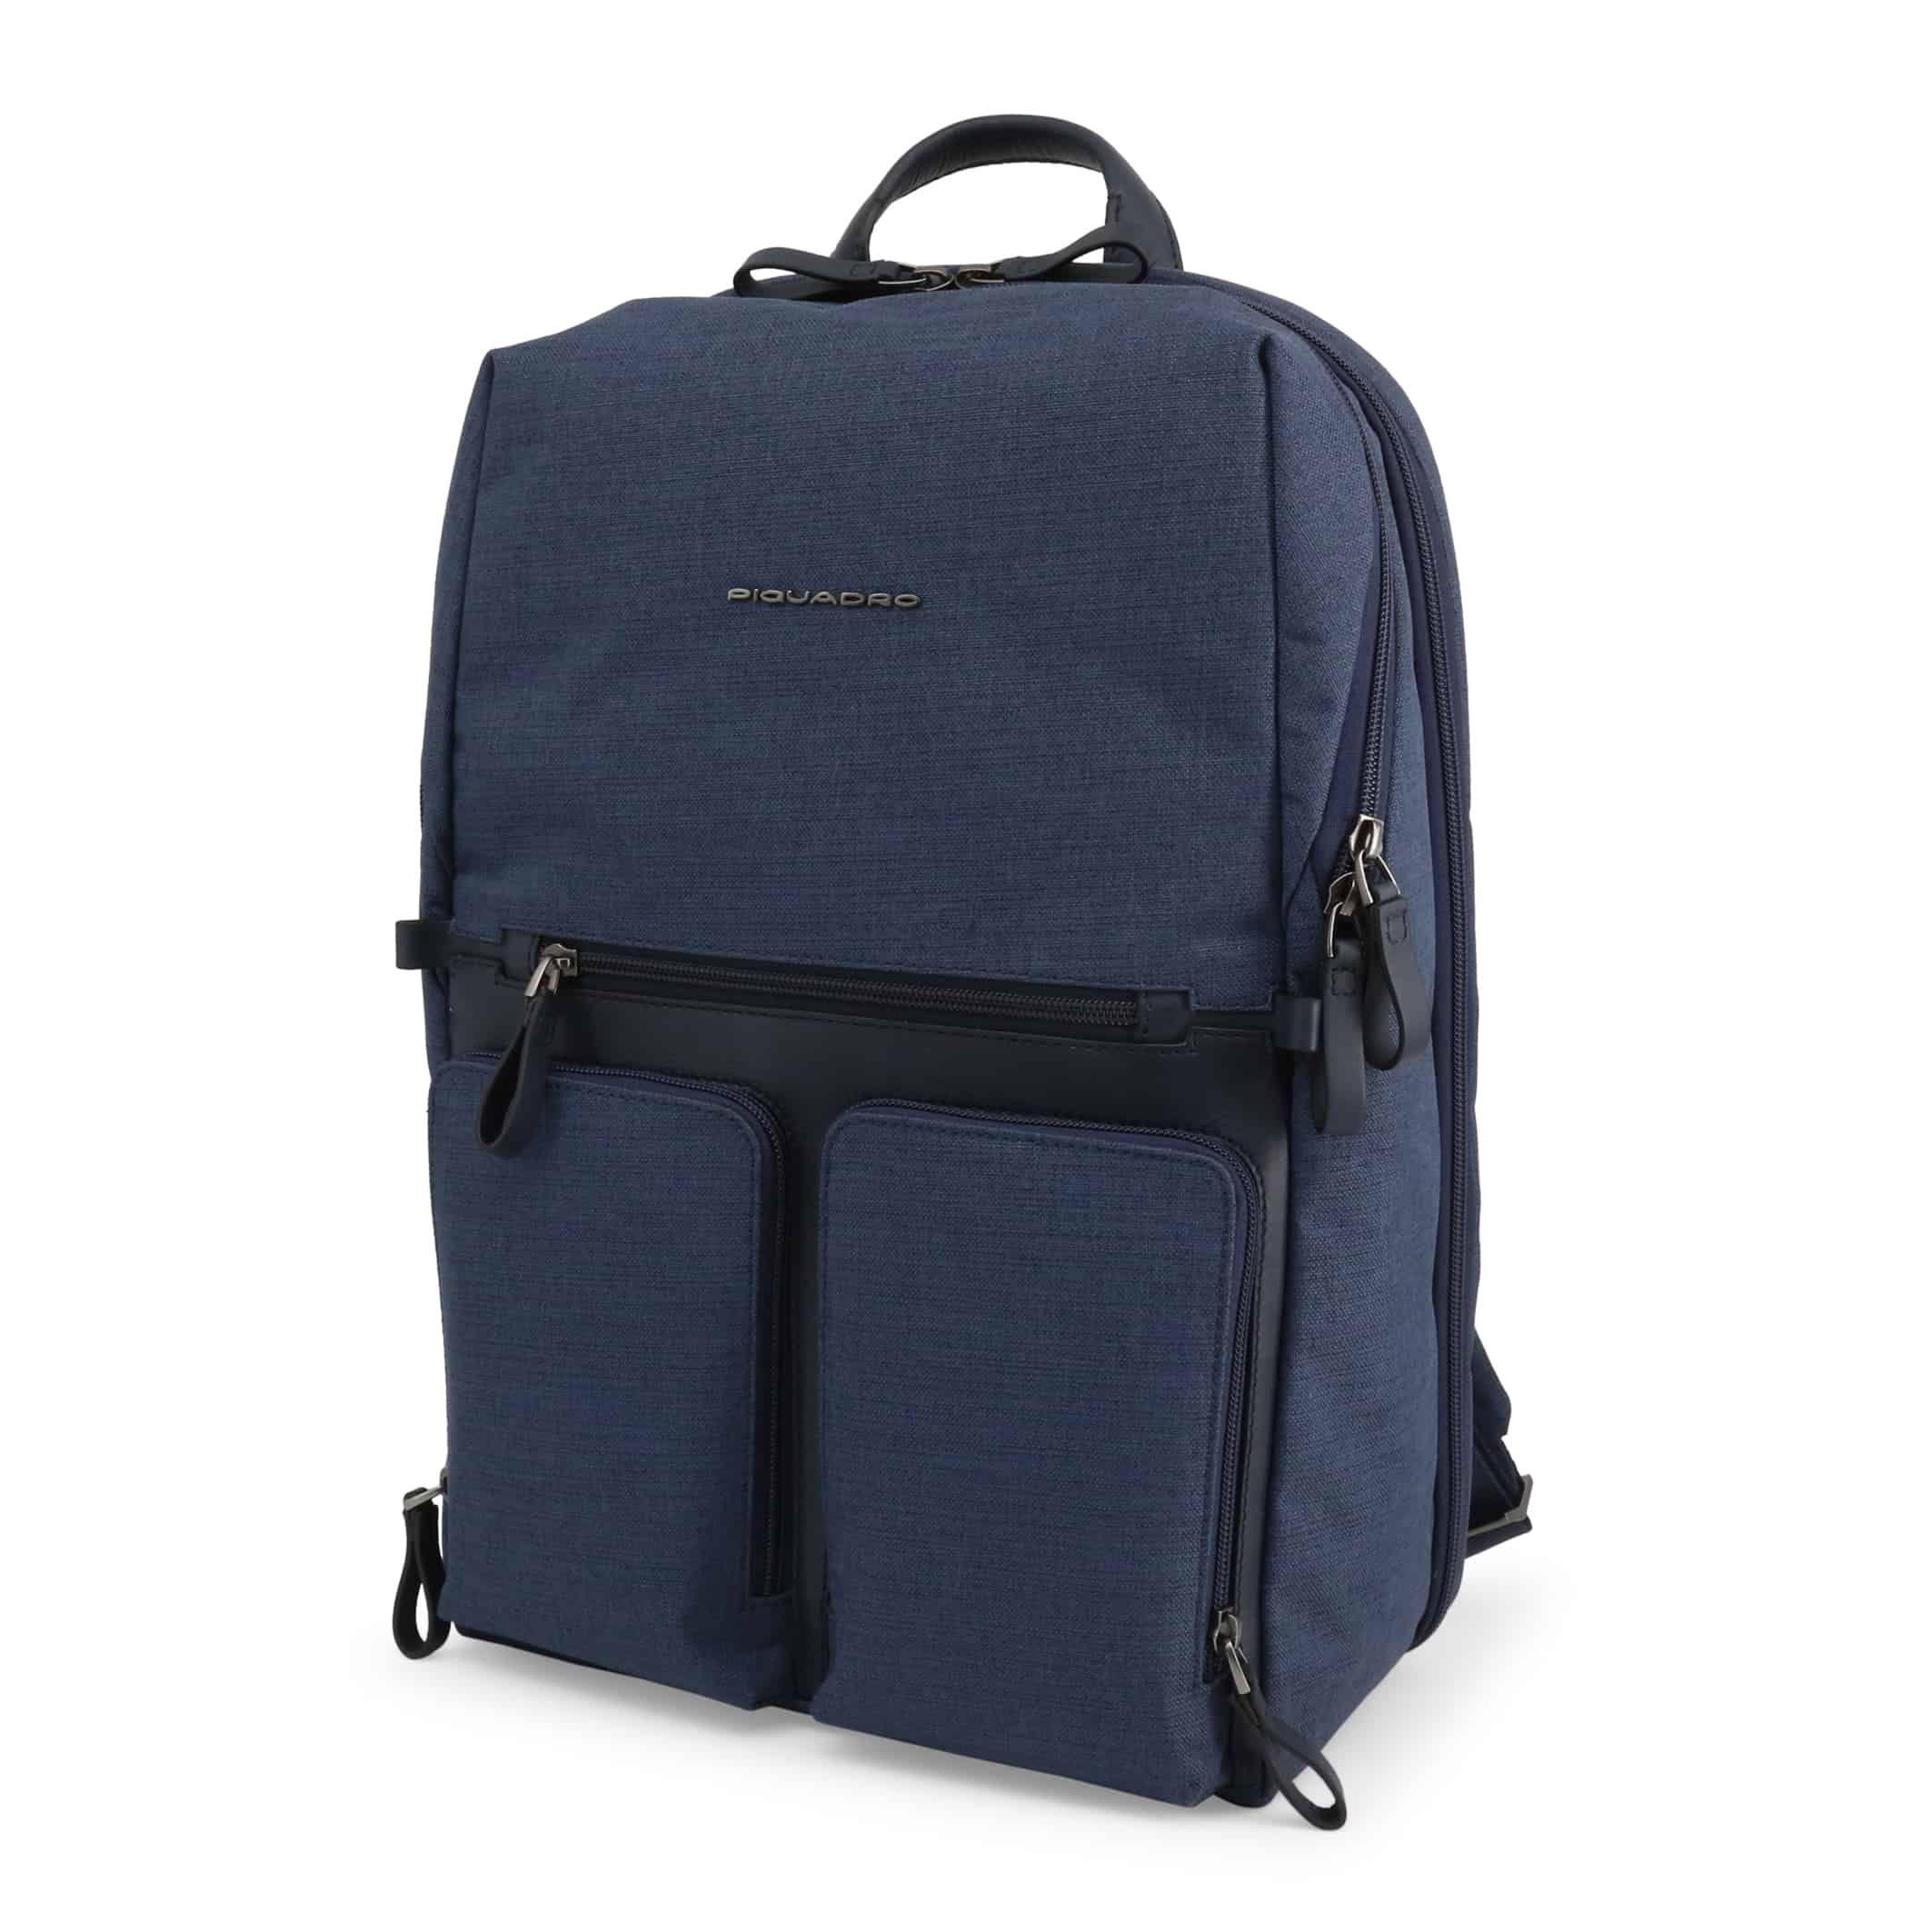 Rucksäcke Piquadro – CA4541W98 – Blau